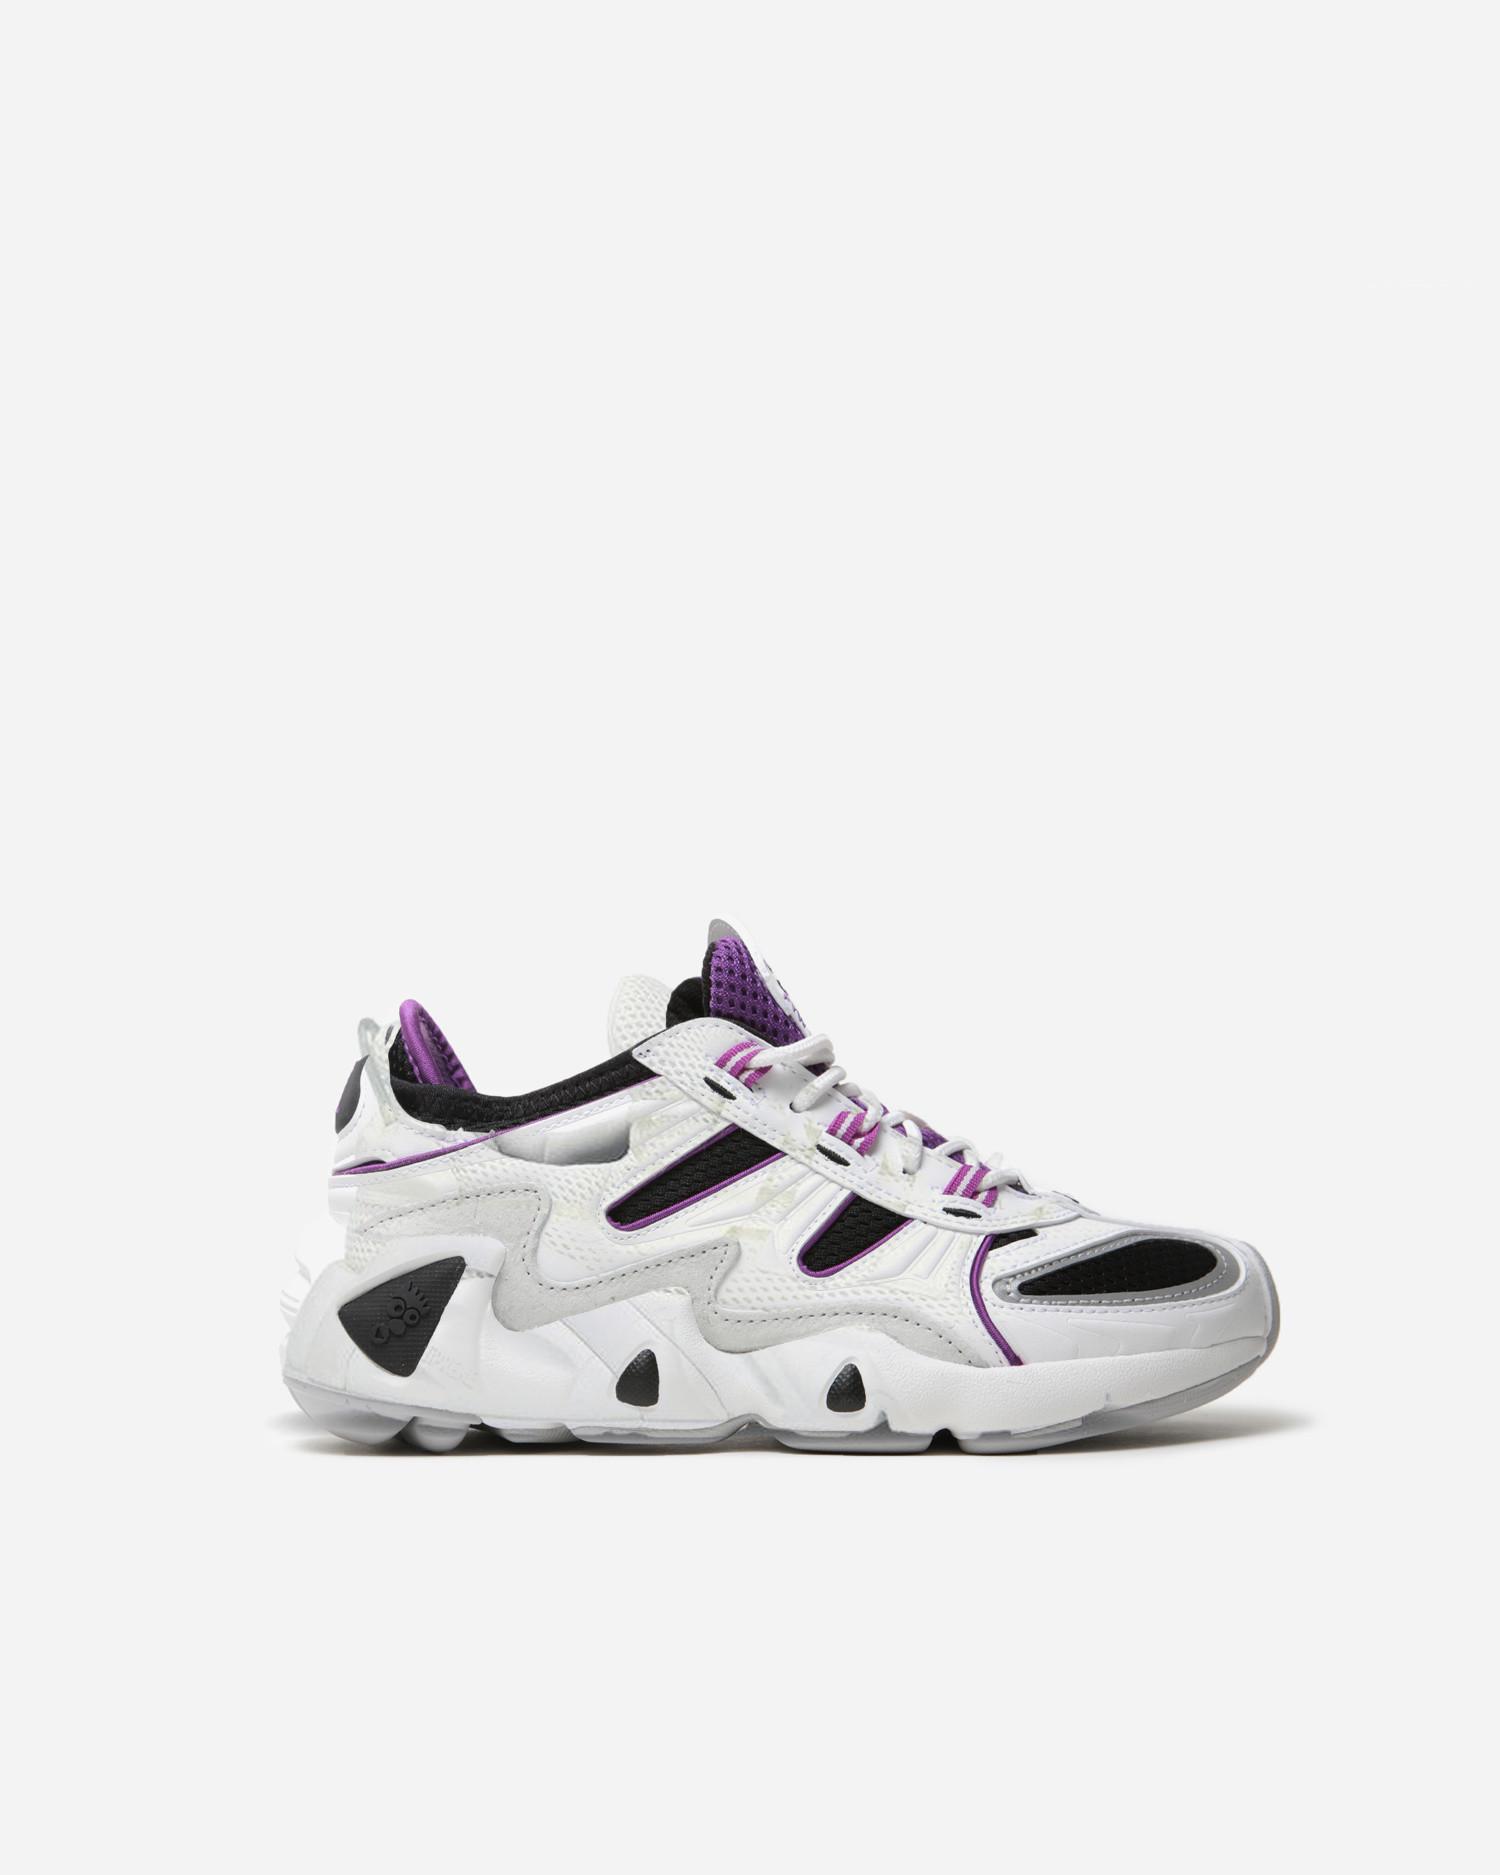 Adidas fyw s-97 w          crywht/cblack/actpur